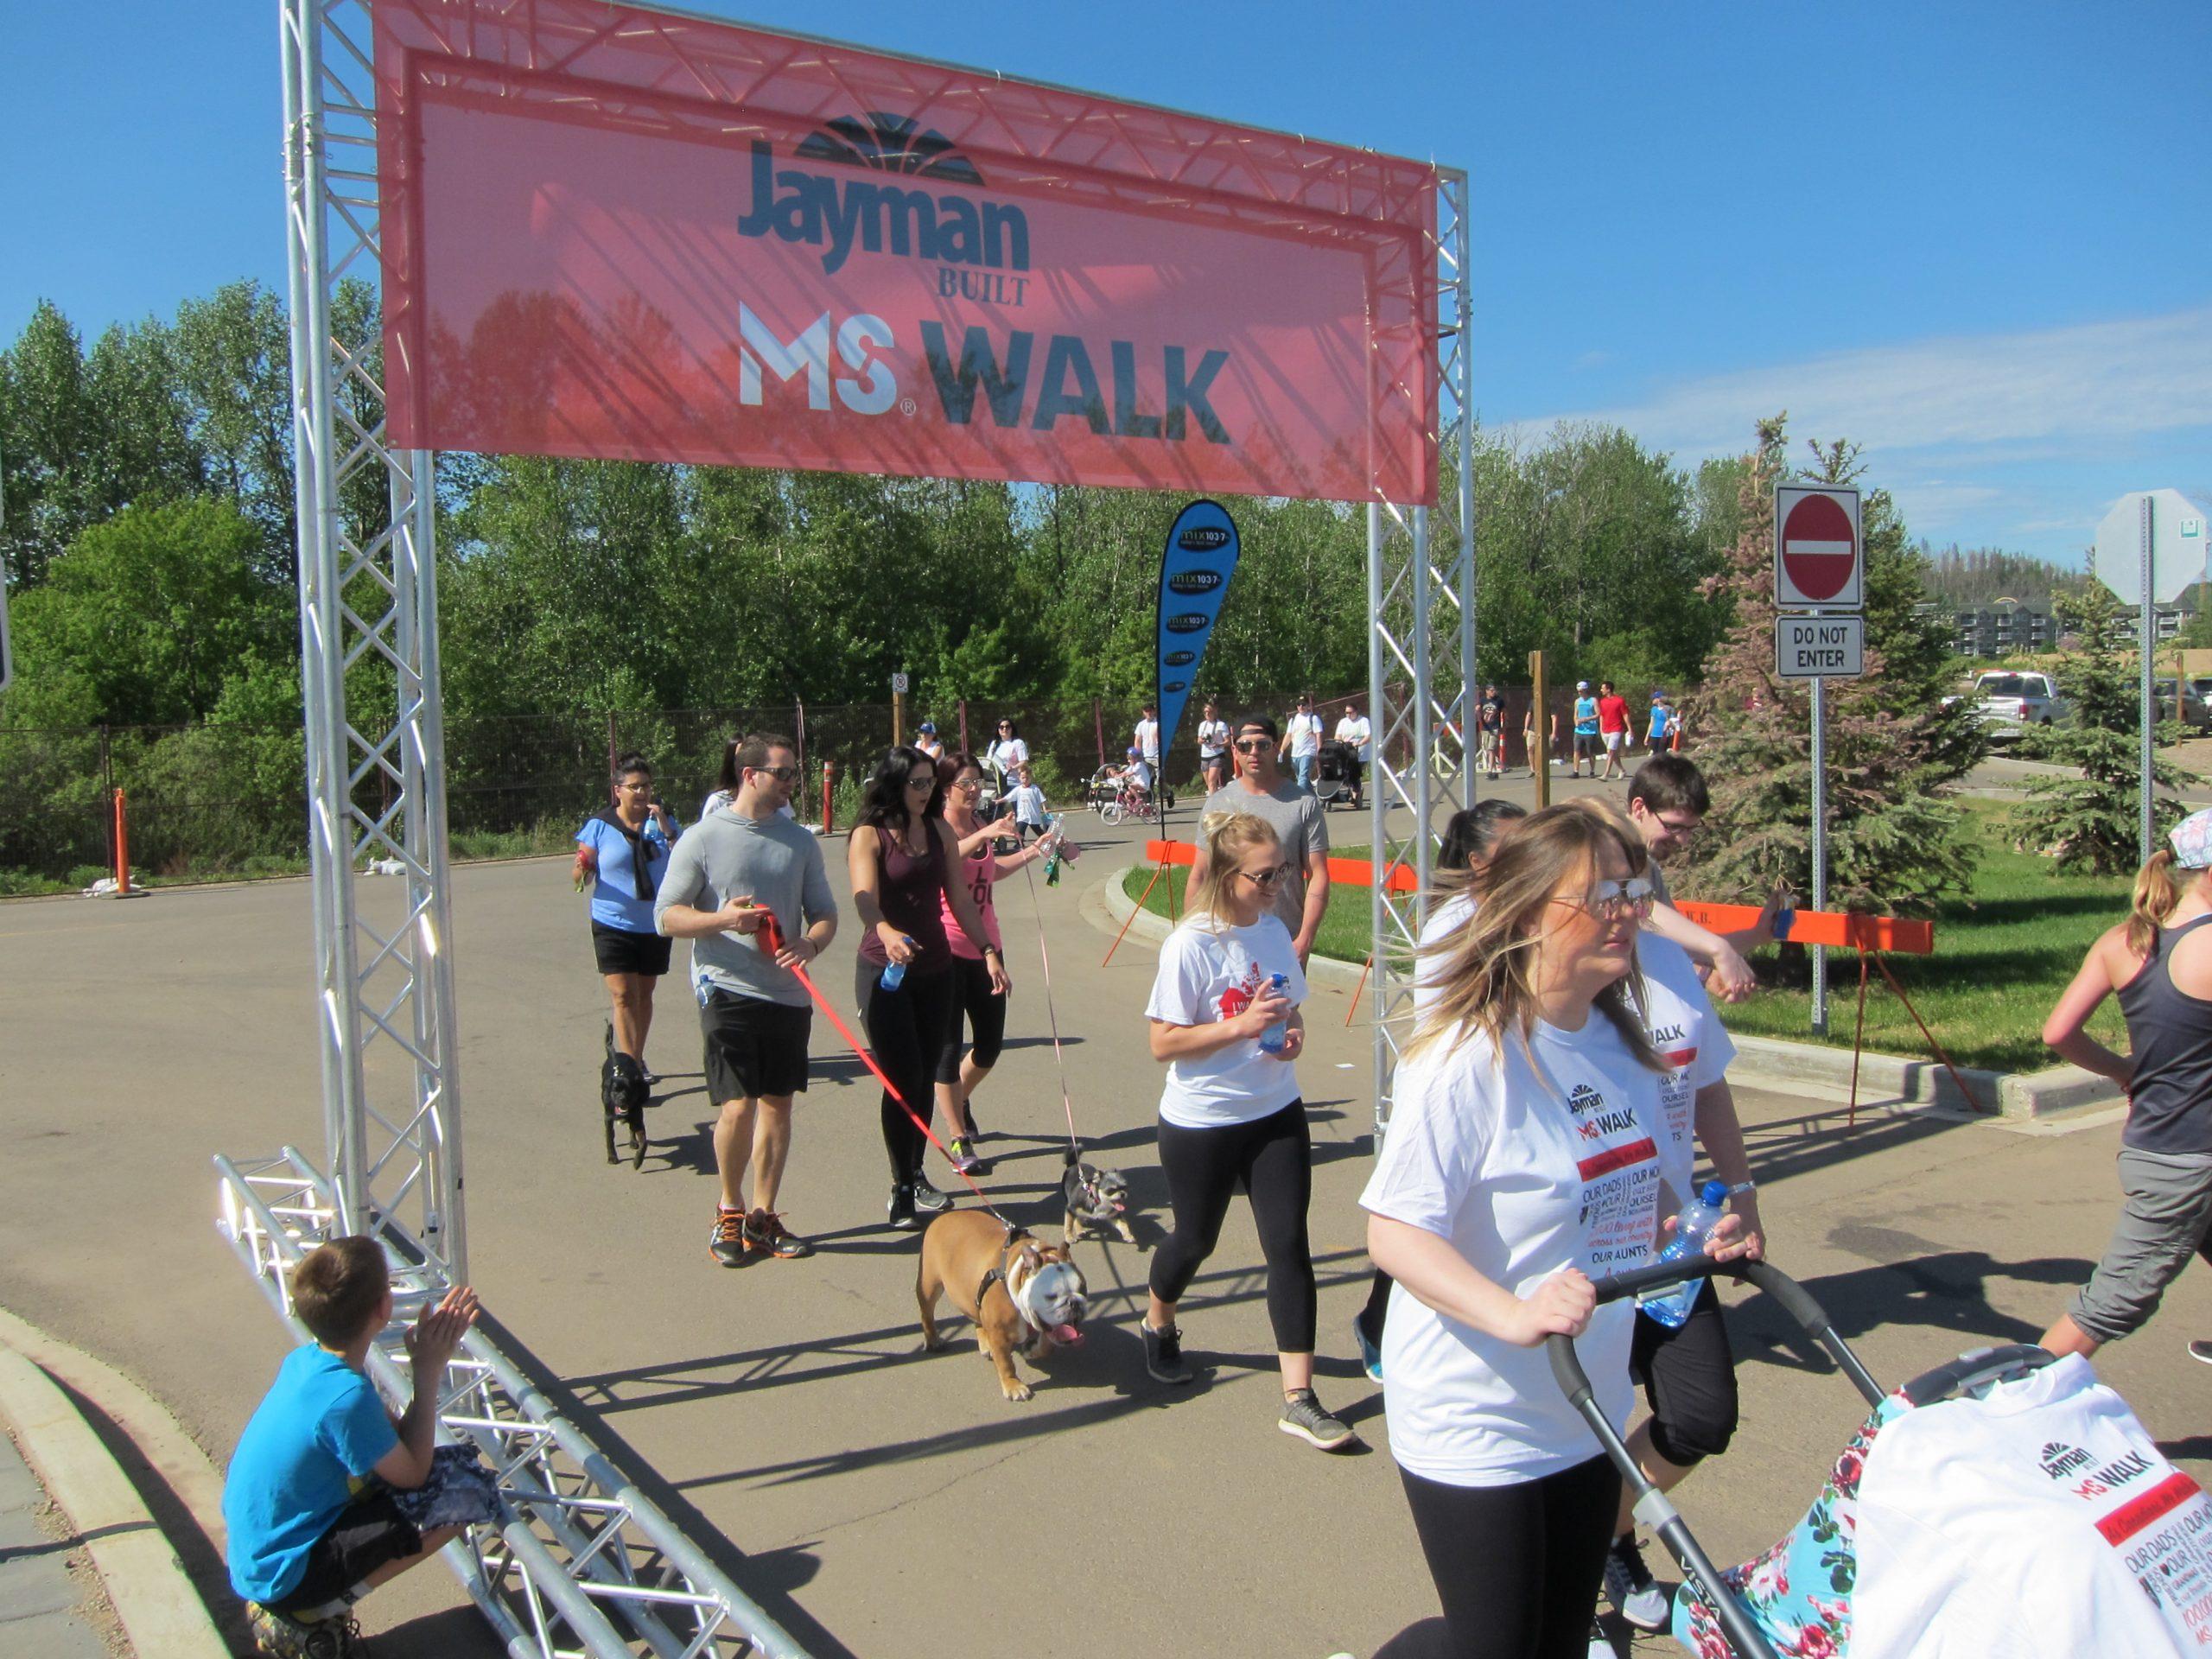 Jayman BUILT MS Walk Makes Triumphant Return After One Year Hiatus